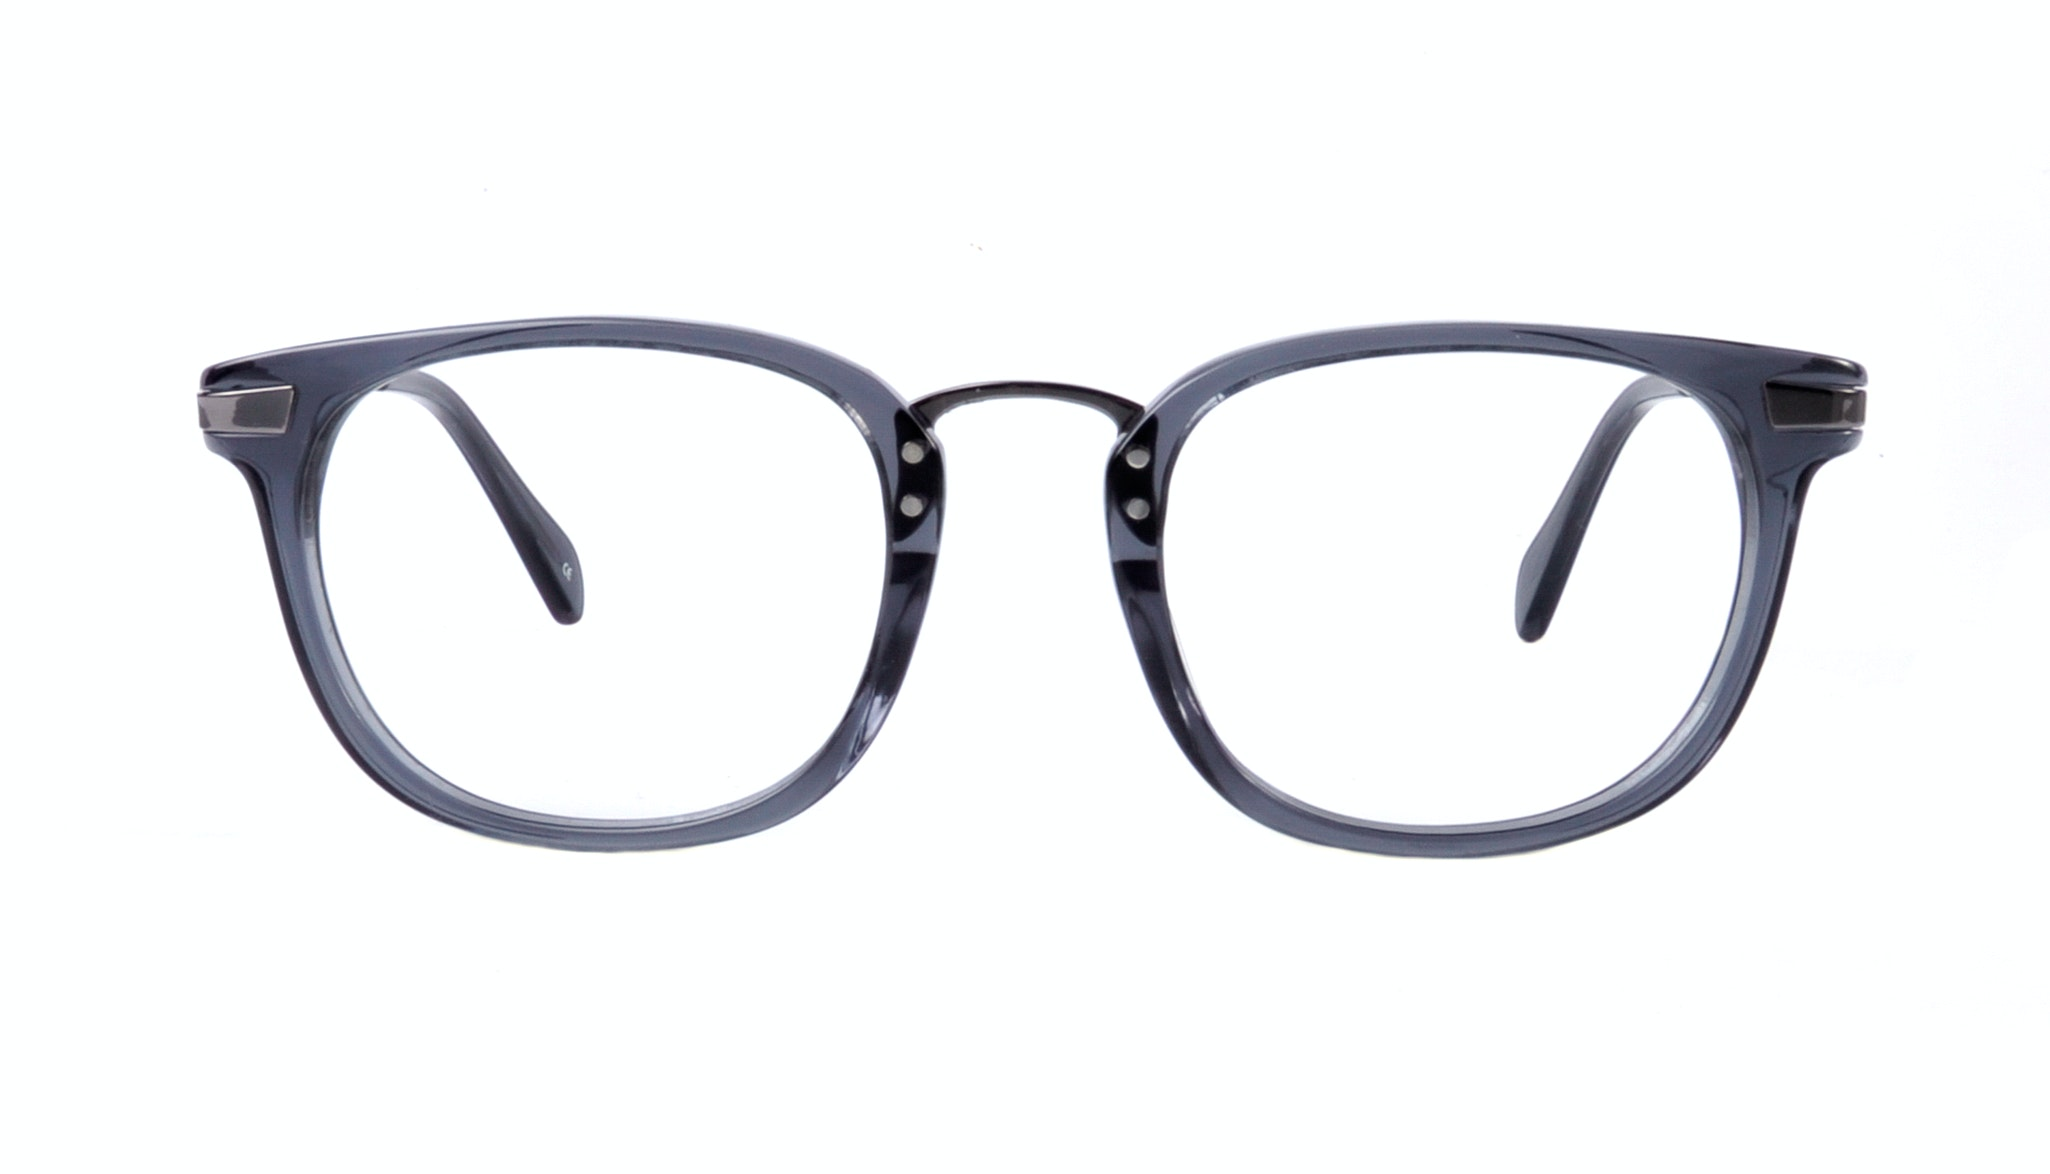 Affordable Fashion Glasses Rectangle Eyeglasses Men Women Daze Black Ice